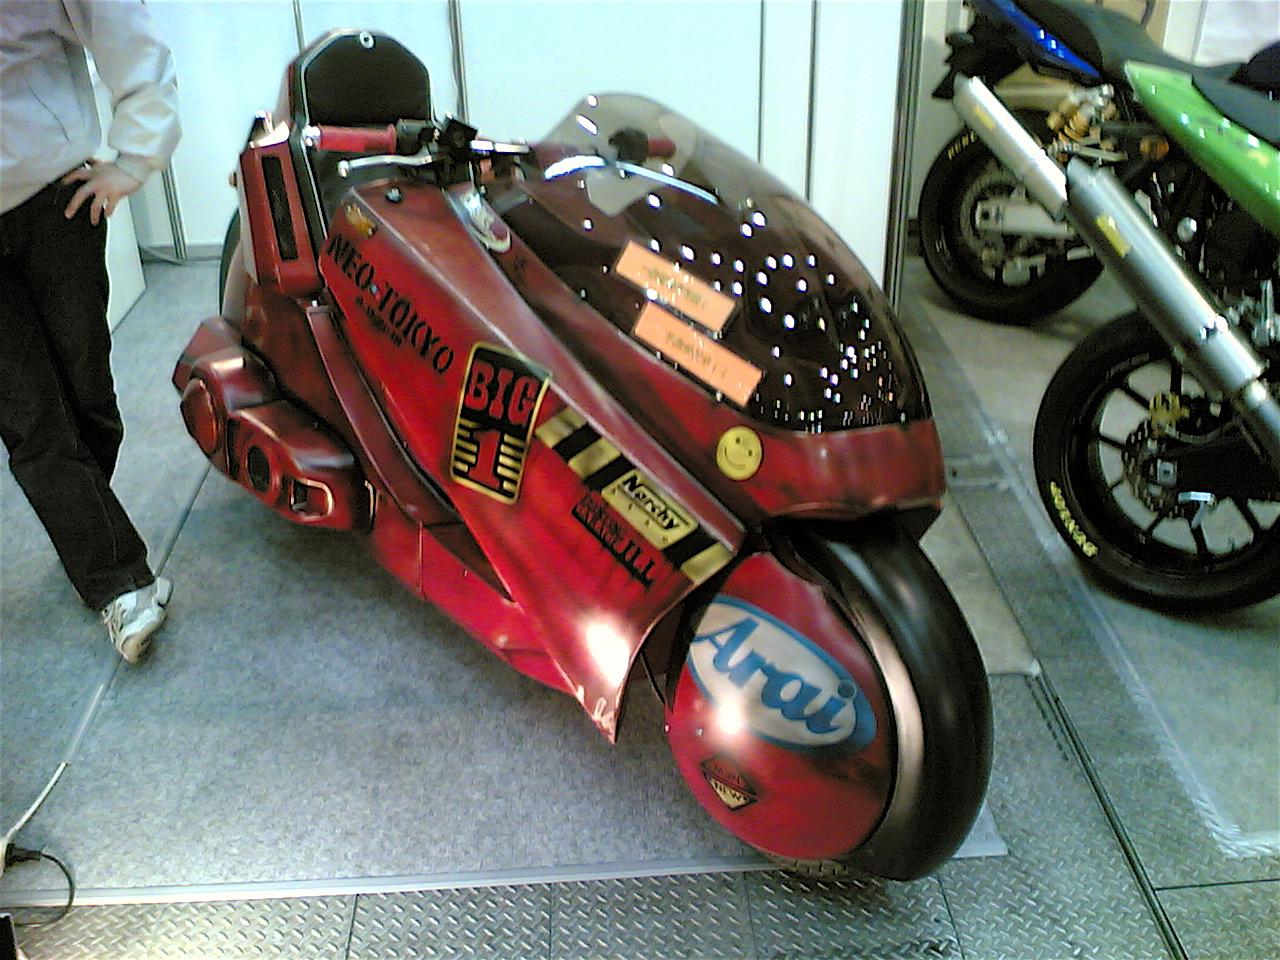 Kanedas bike from Akira